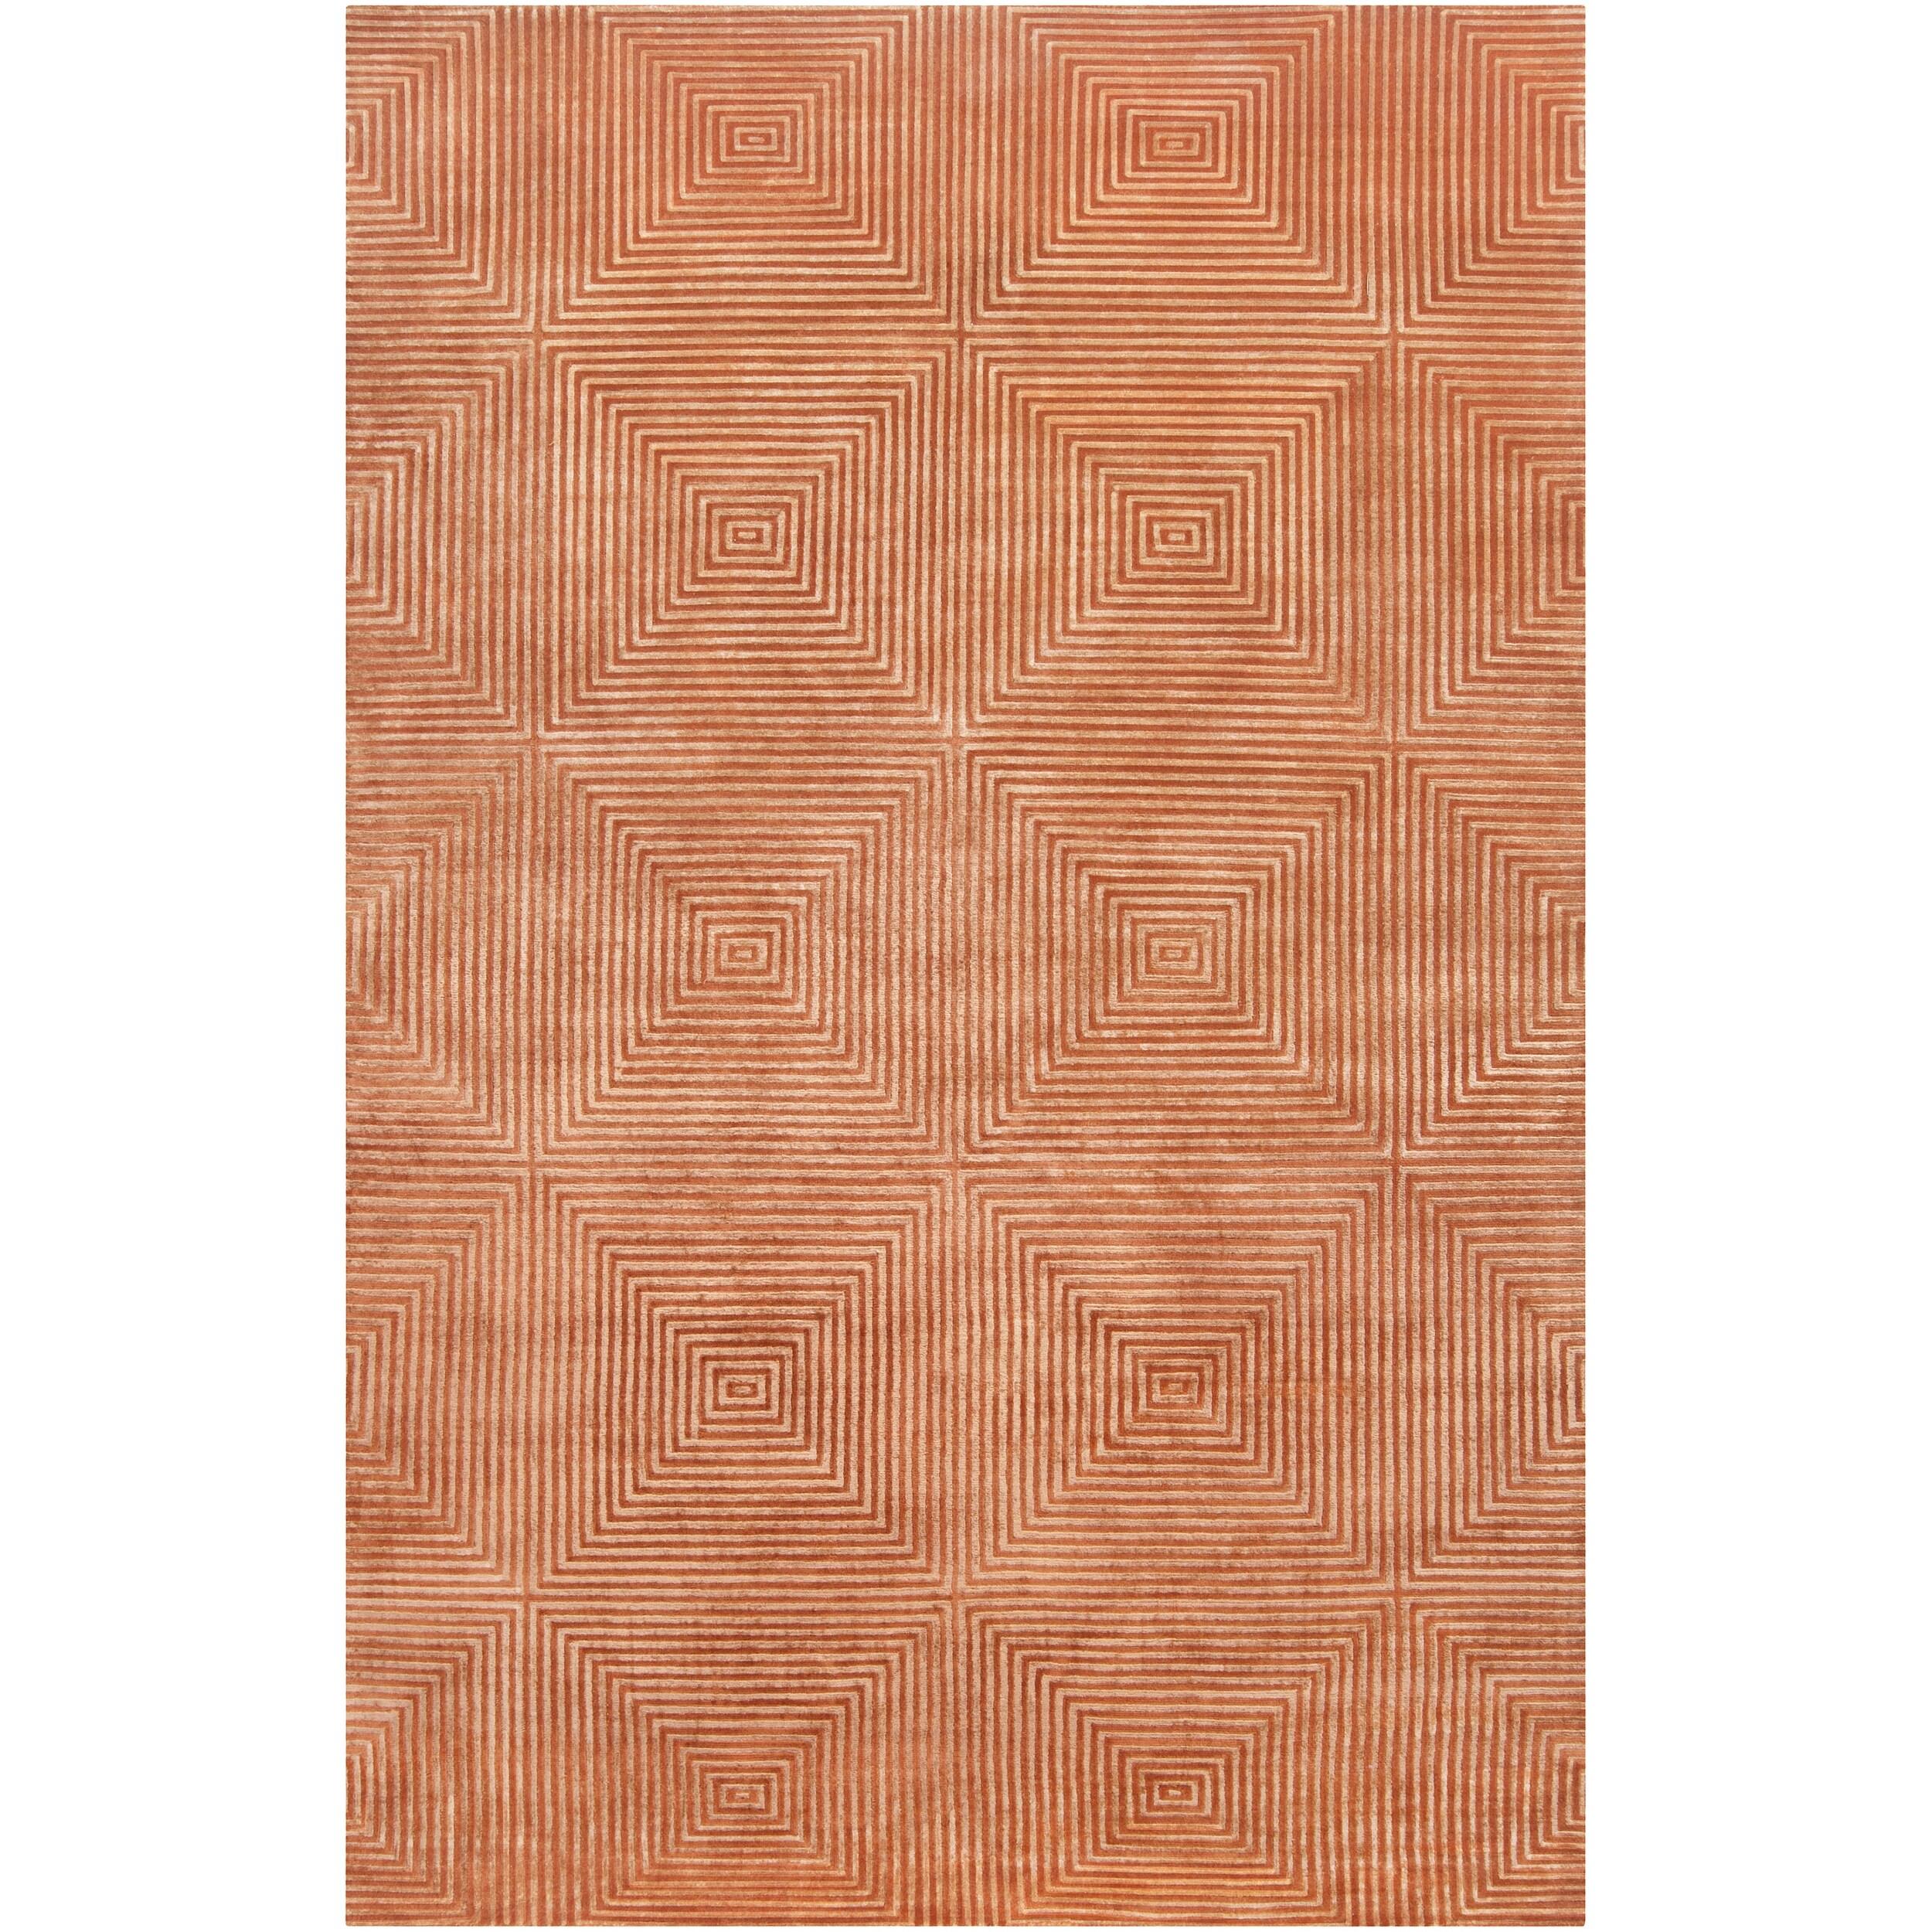 Surya Candice Olson Hand-knotted Orange Arseno Geometric Wool Rug (4' x 6') at Sears.com